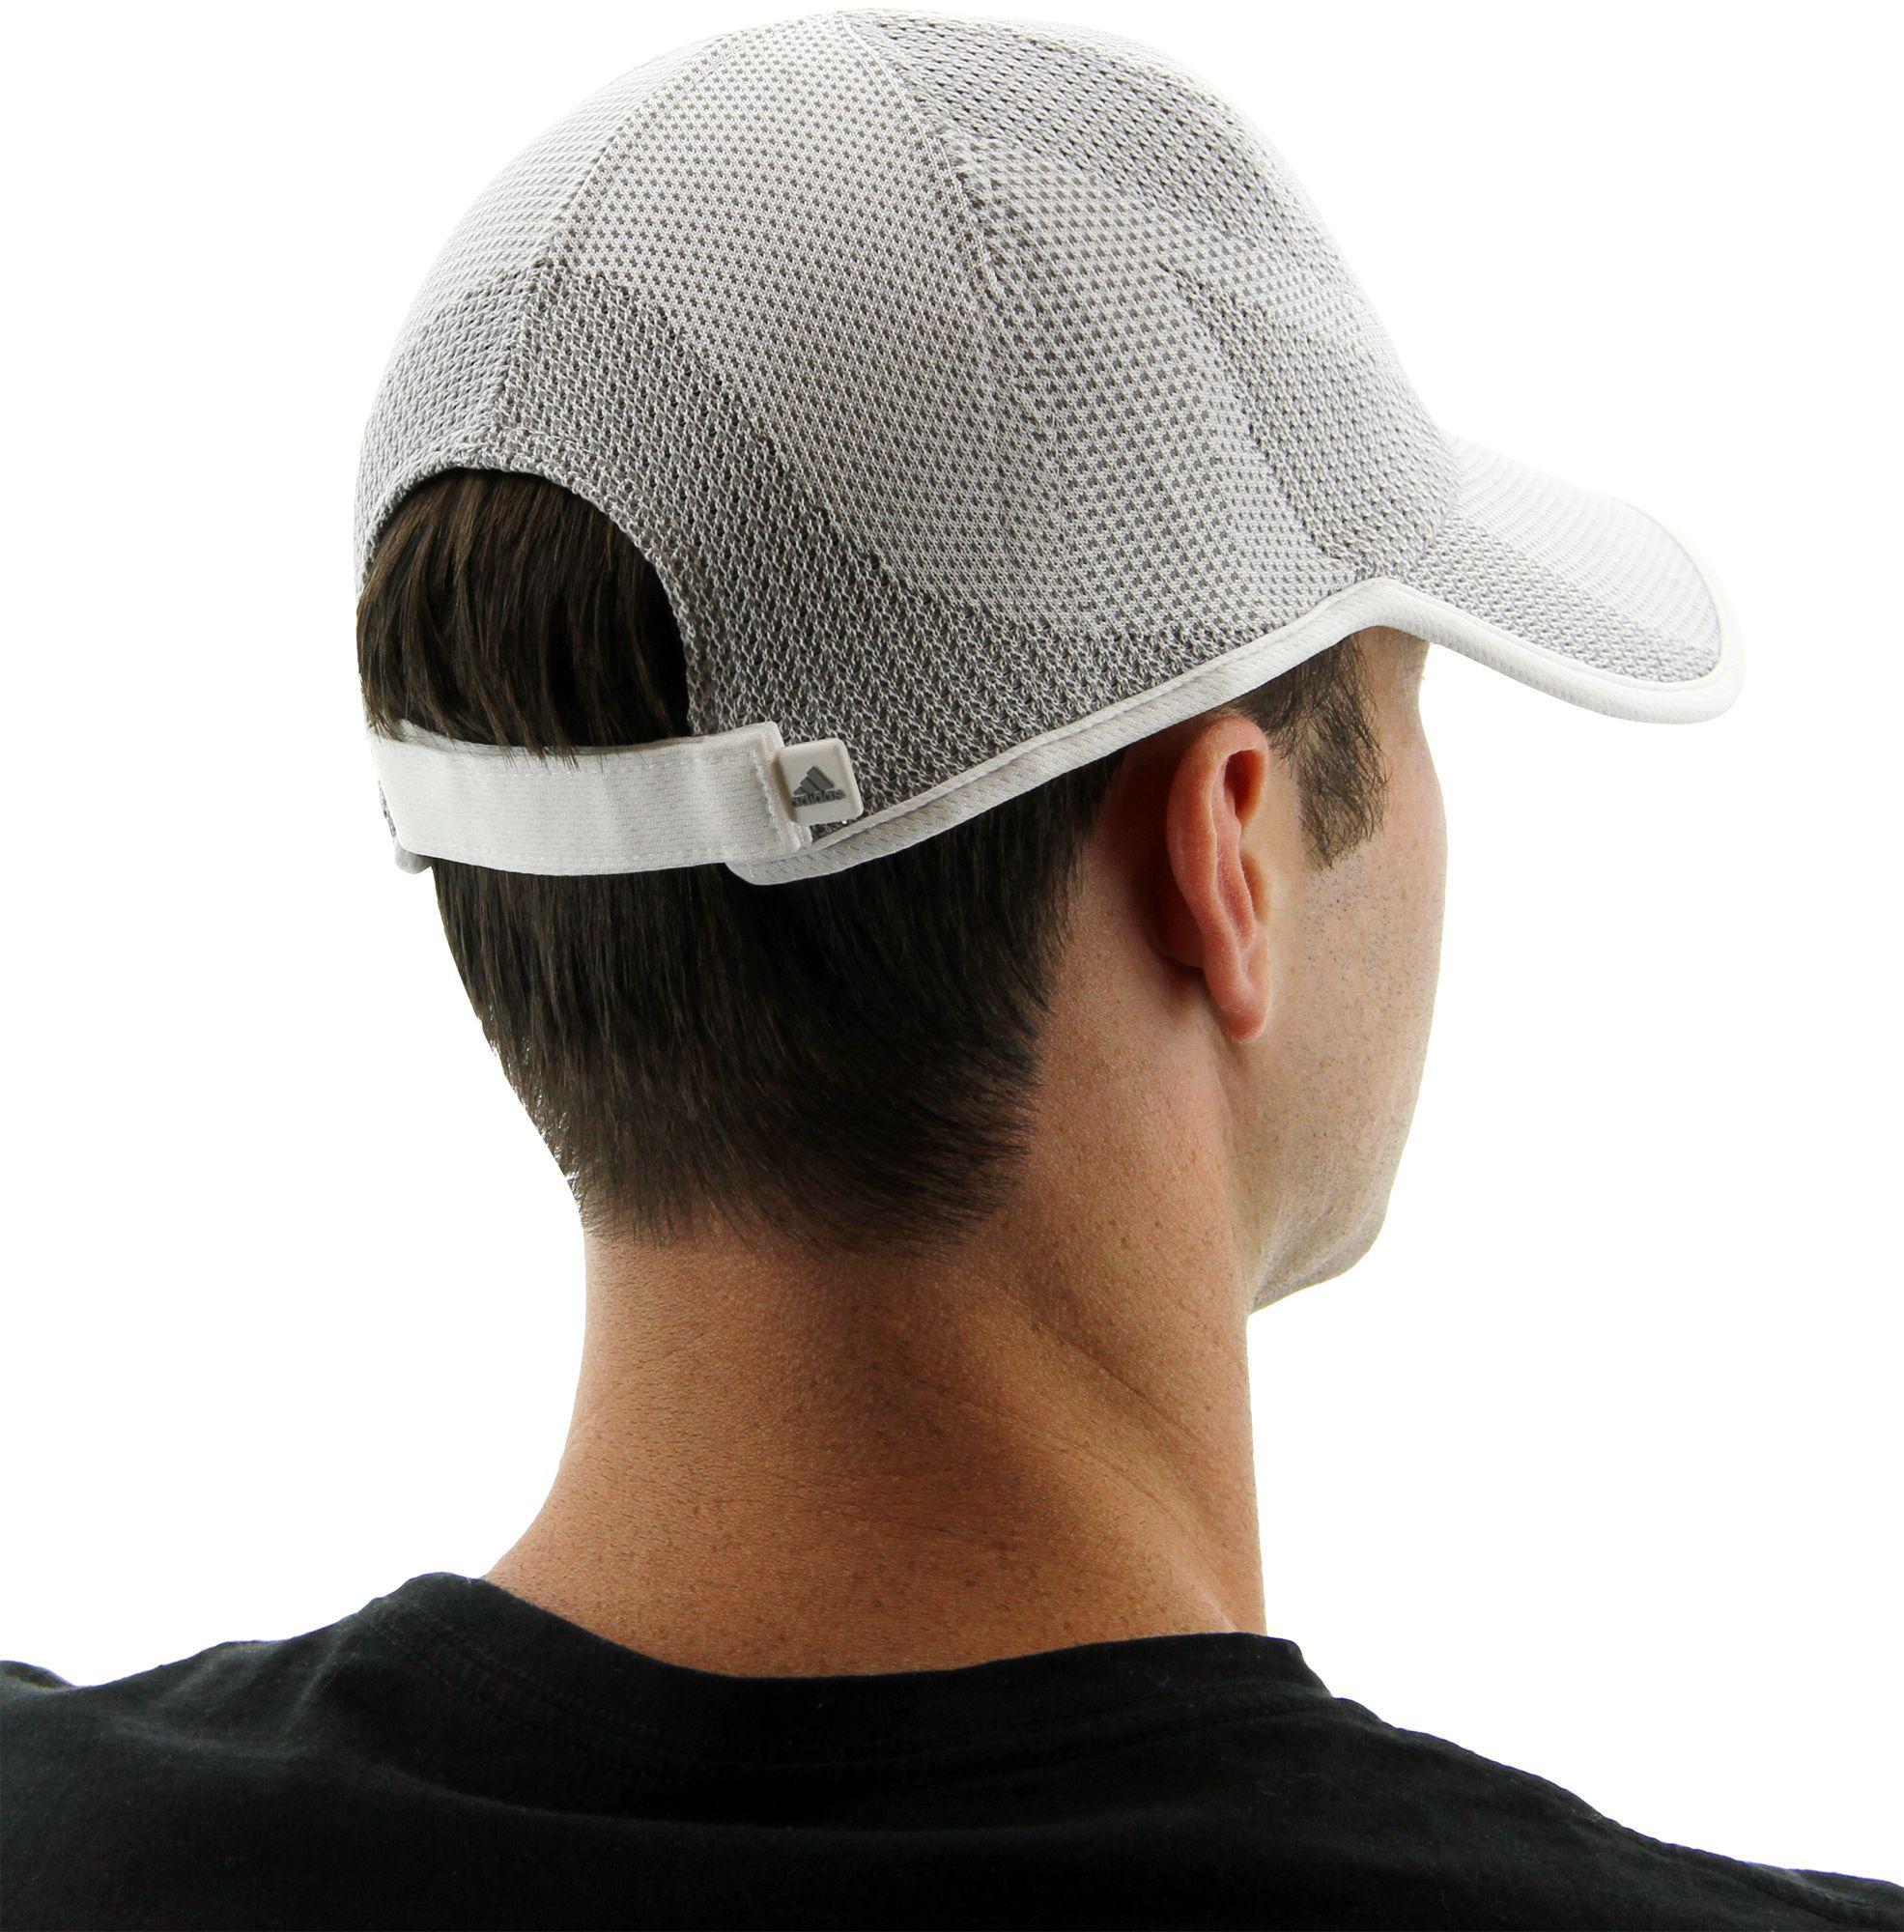 44e0f39c619 Adidas - Gray Adizero Prime Cap for Men - Lyst. View fullscreen